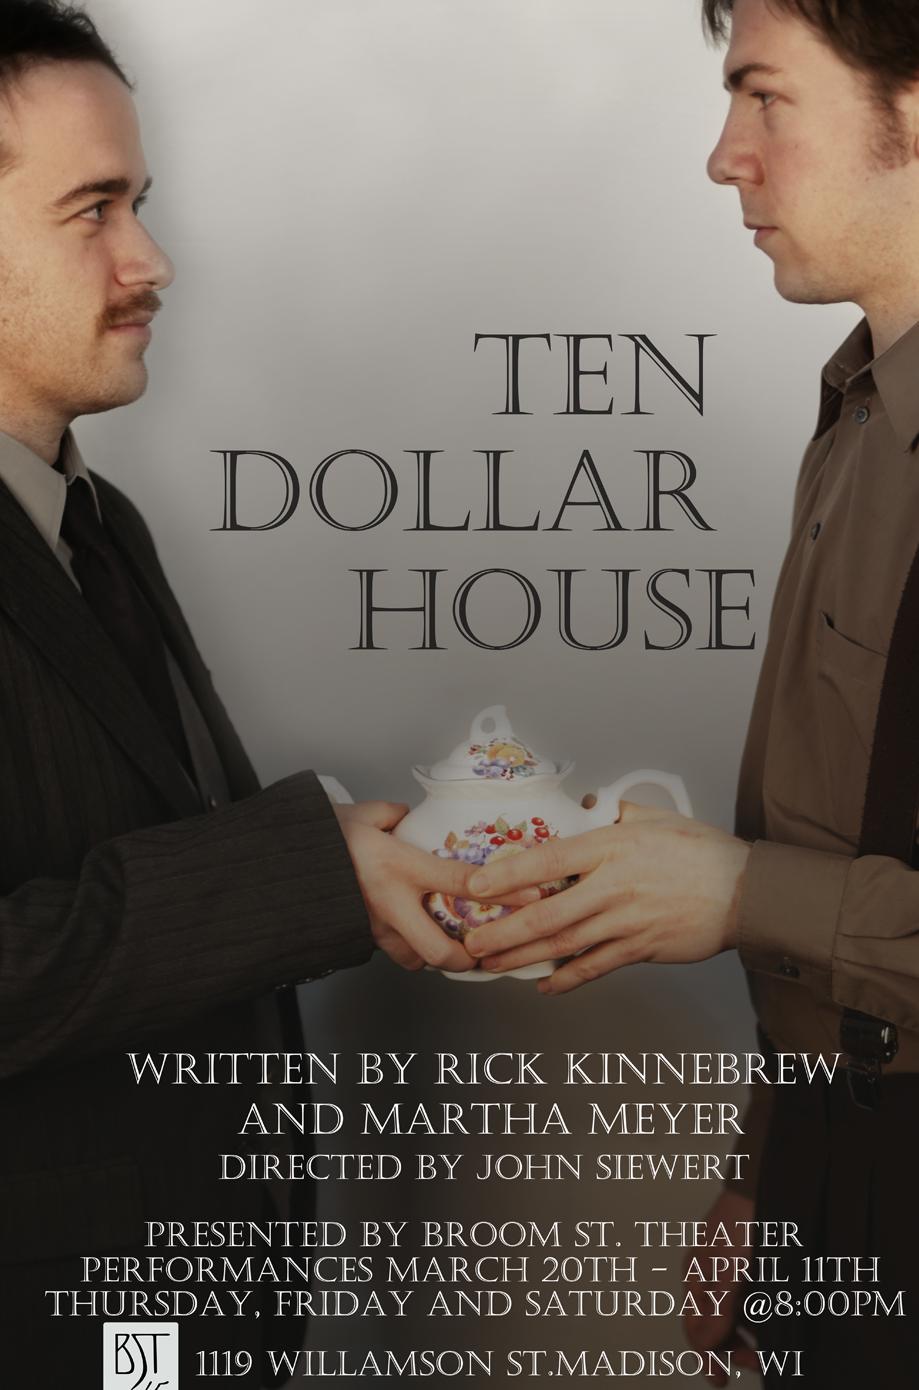 10dollarhouse__b_Poster_quarter_sheet.jpg